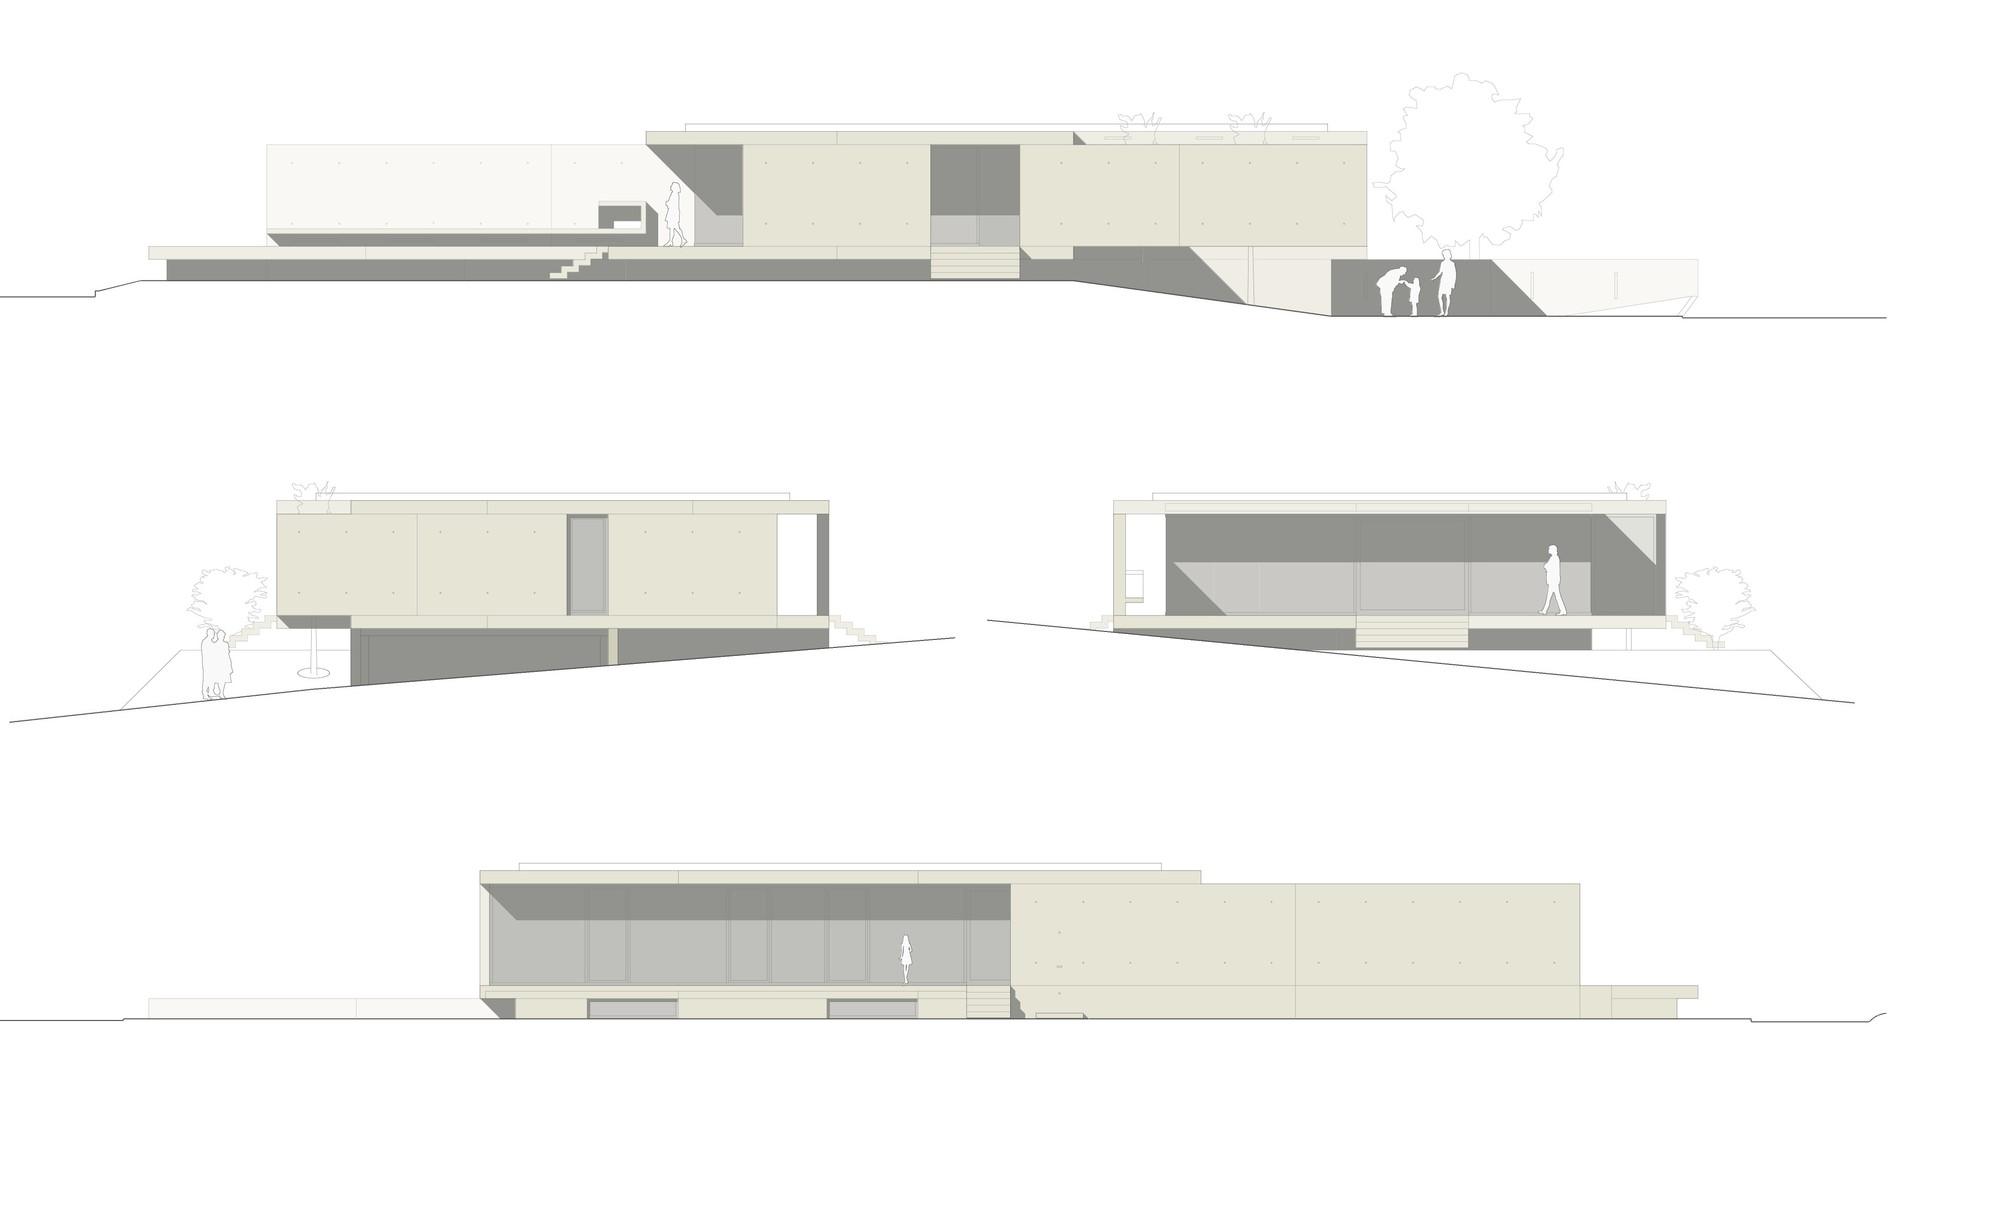 gallery of house at zimmerberg bottom rossetti wyss architekten 20. Black Bedroom Furniture Sets. Home Design Ideas